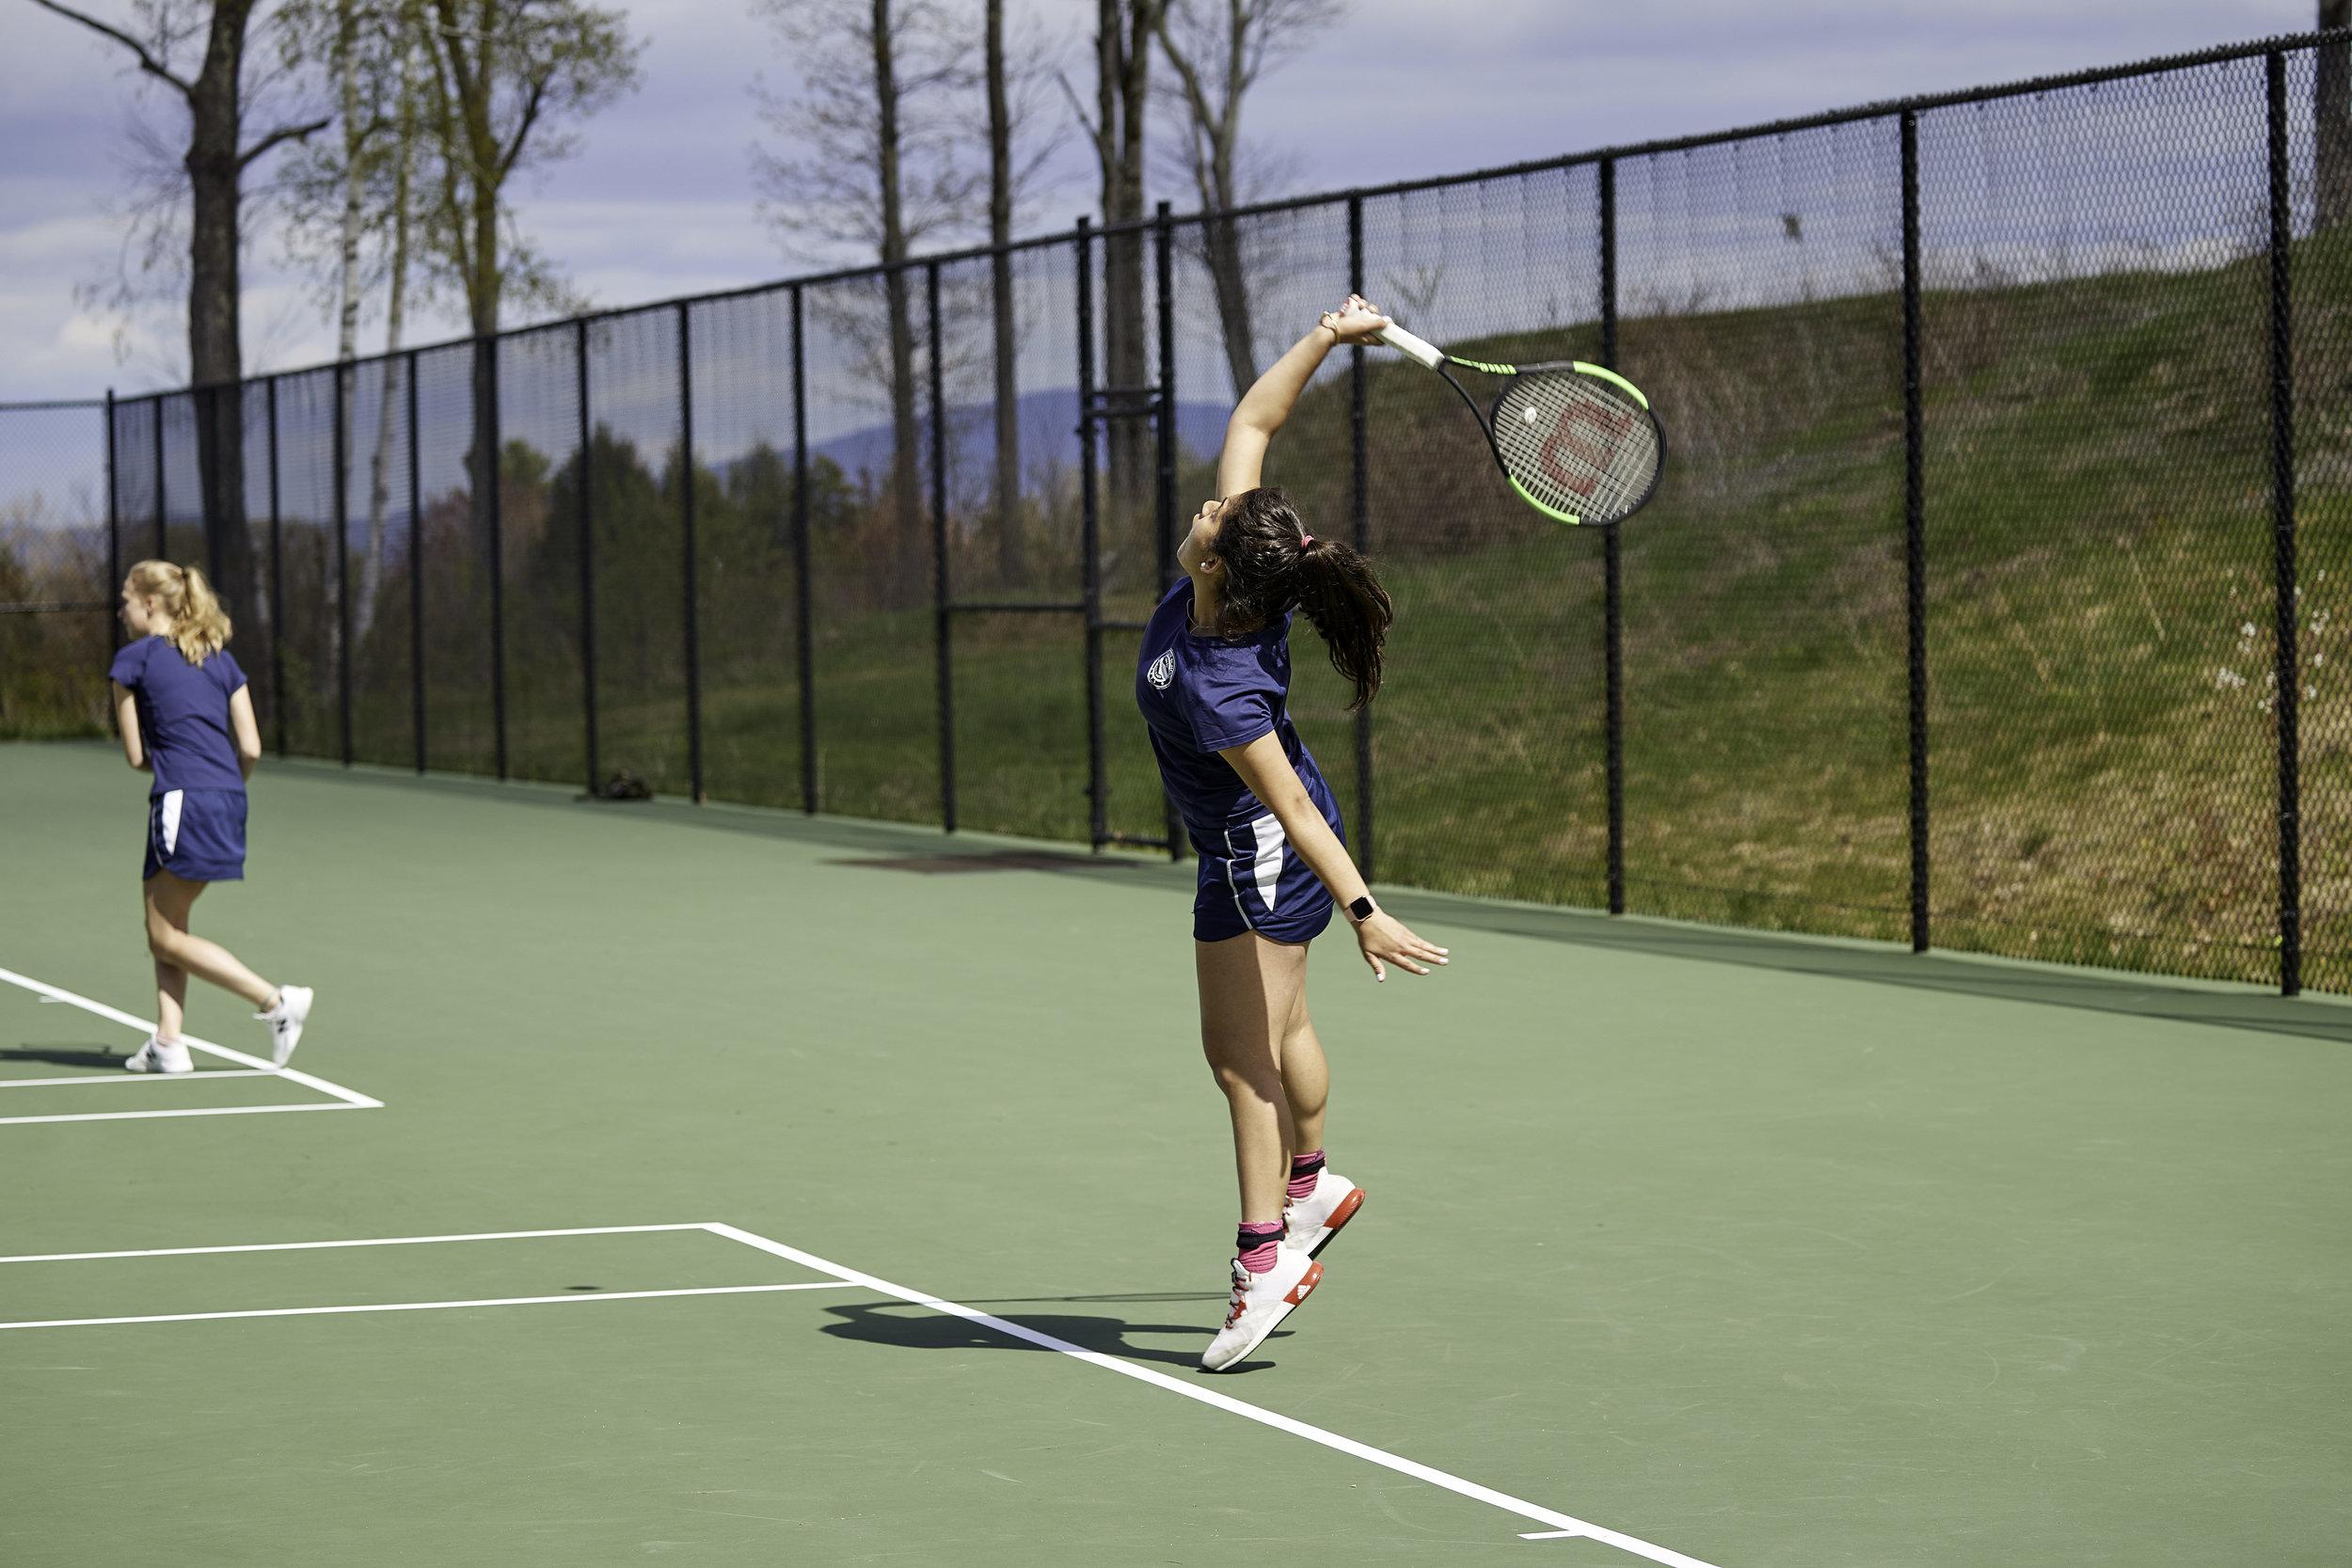 Girls Tennis vs. Winchendon School - May 15, 2019 -195178.jpg